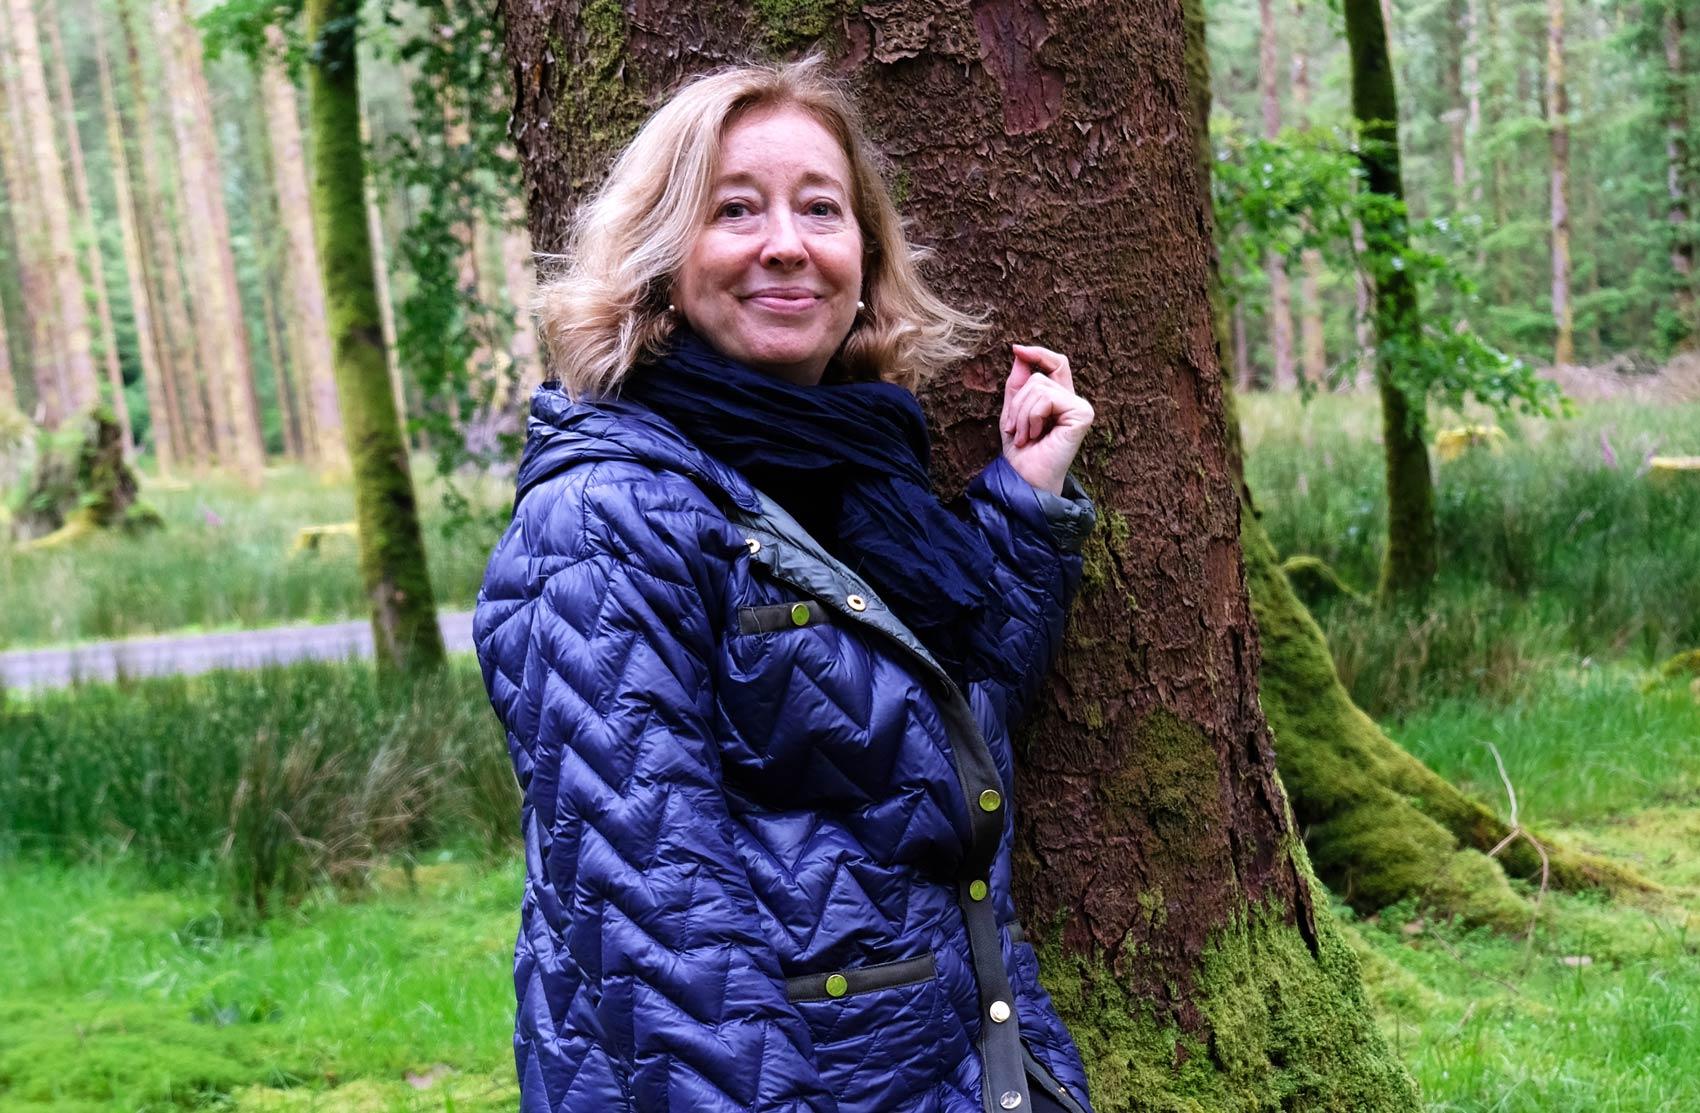 Pura Gimenez Turismo Irlanda Mujer Etheria magazine